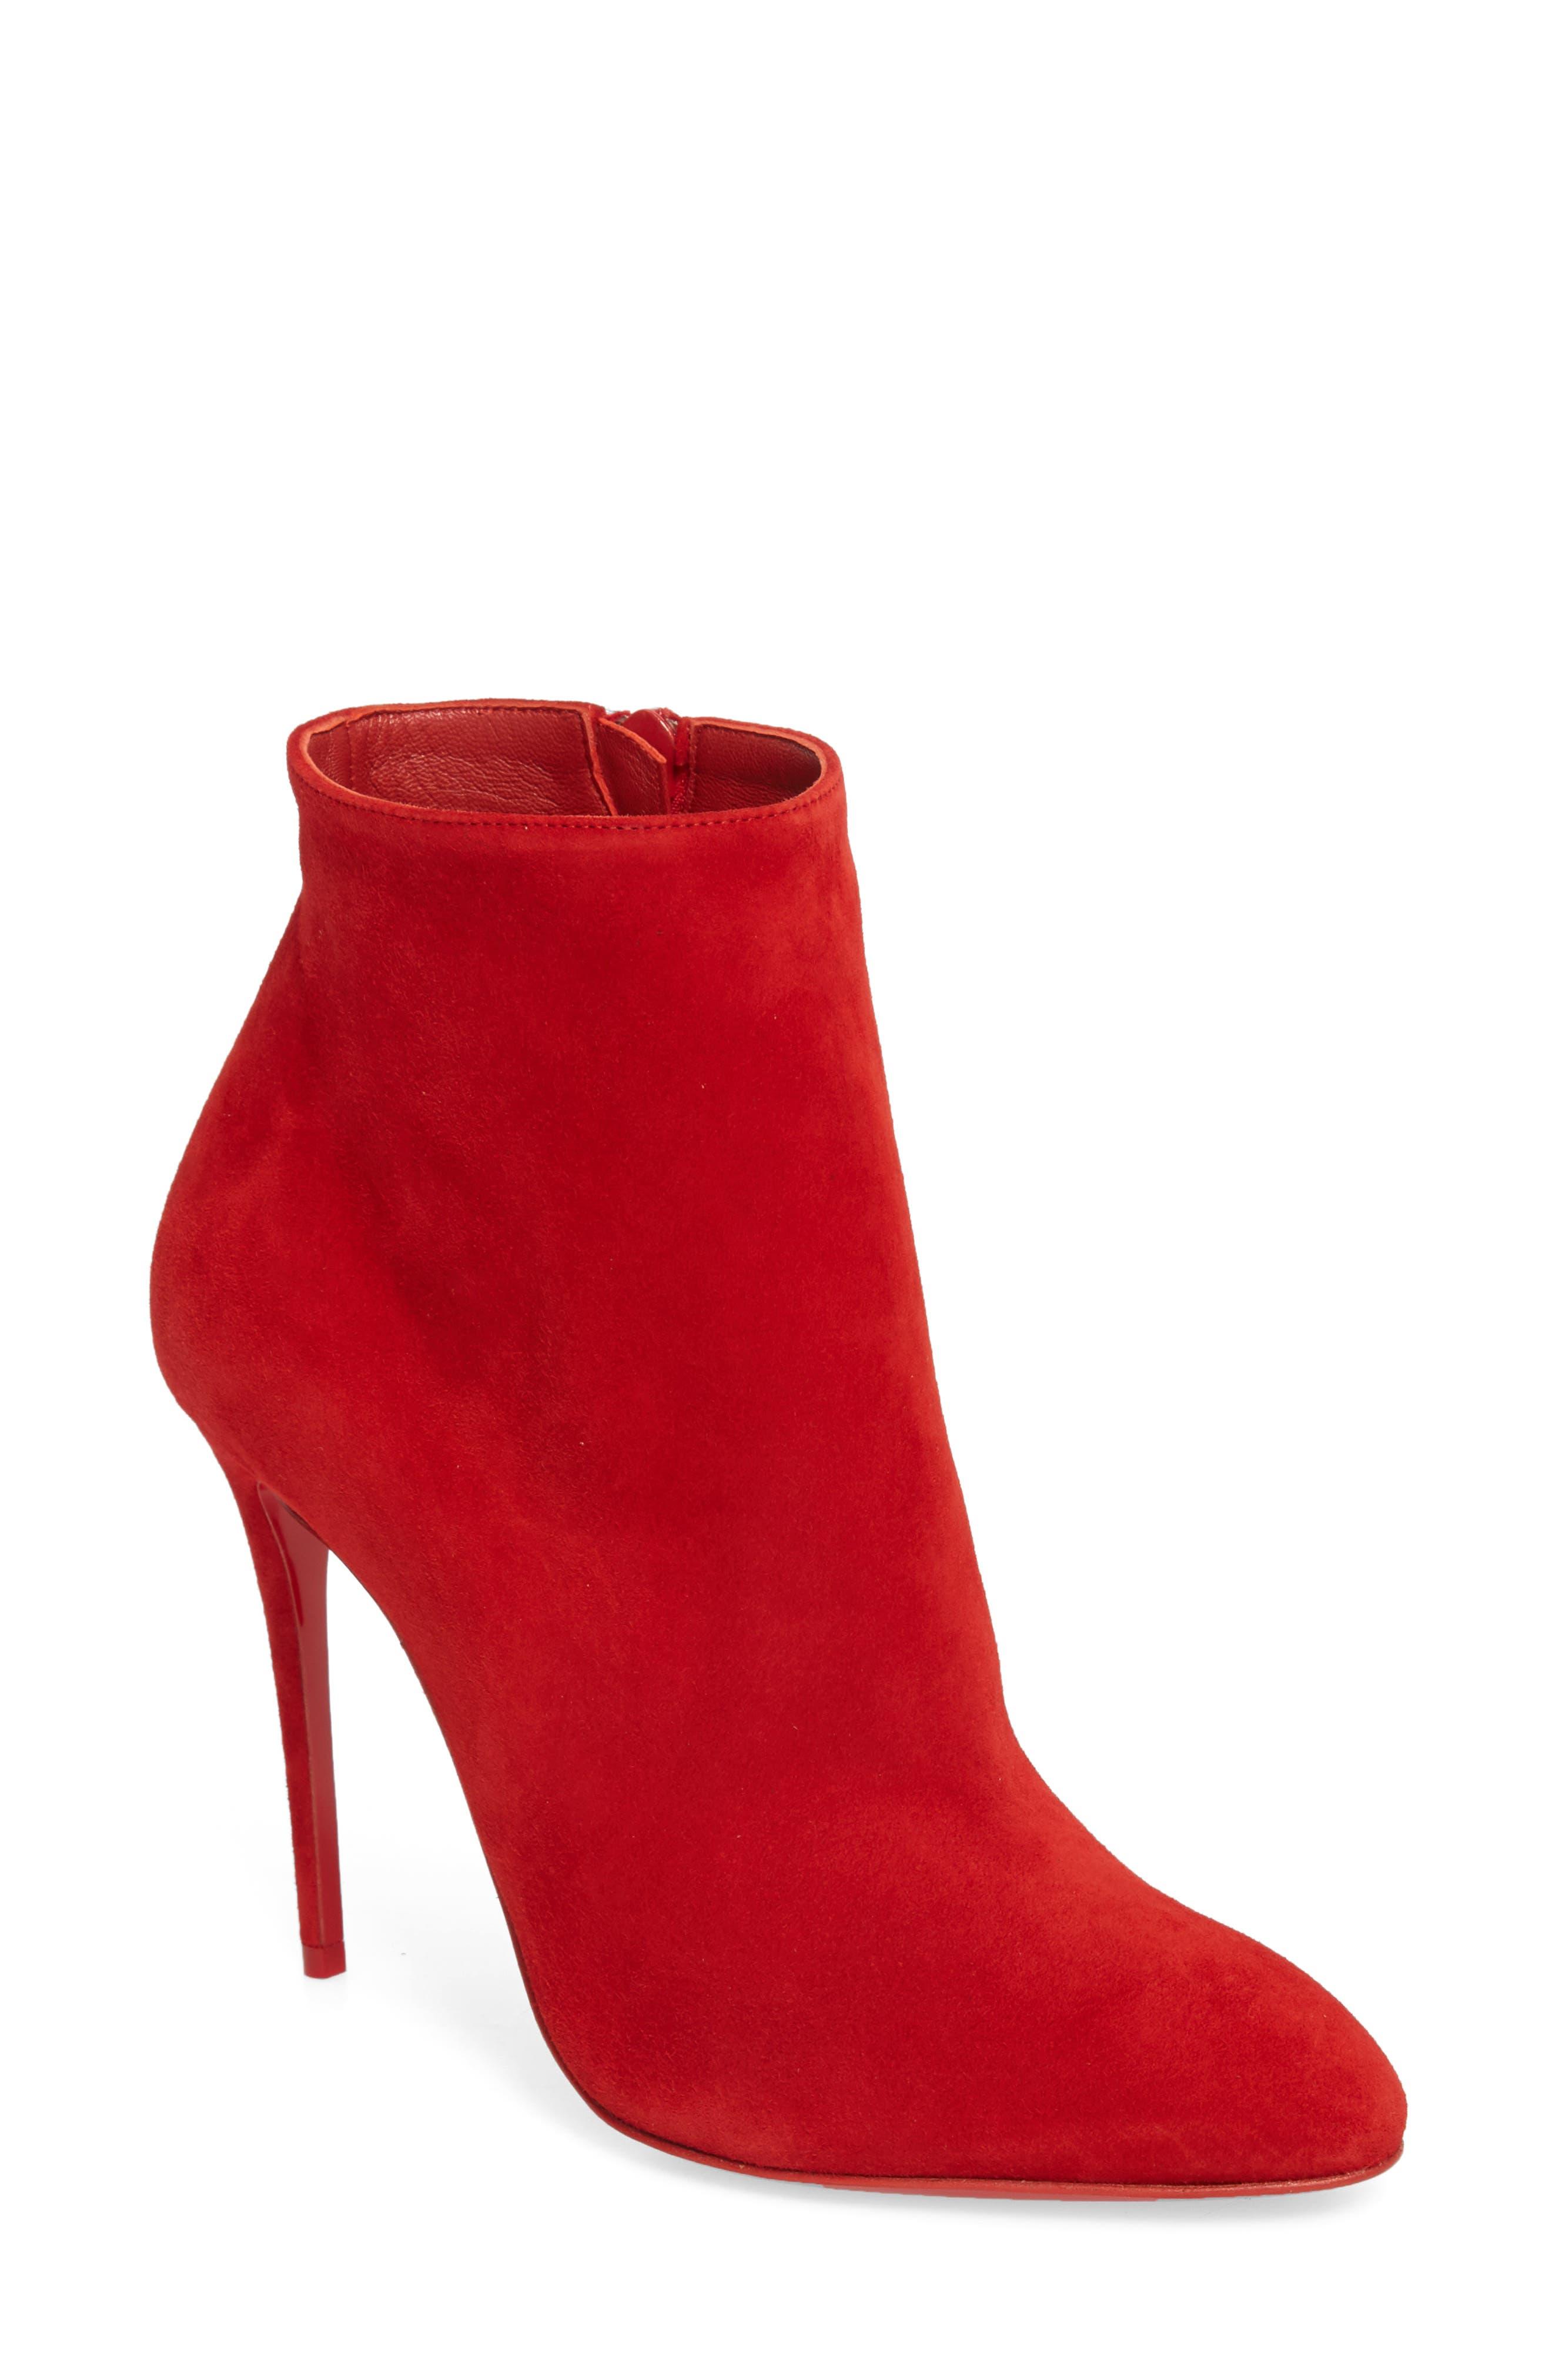 Eloise Almond Toe Bootie,                         Main,                         color, LOUBI RED